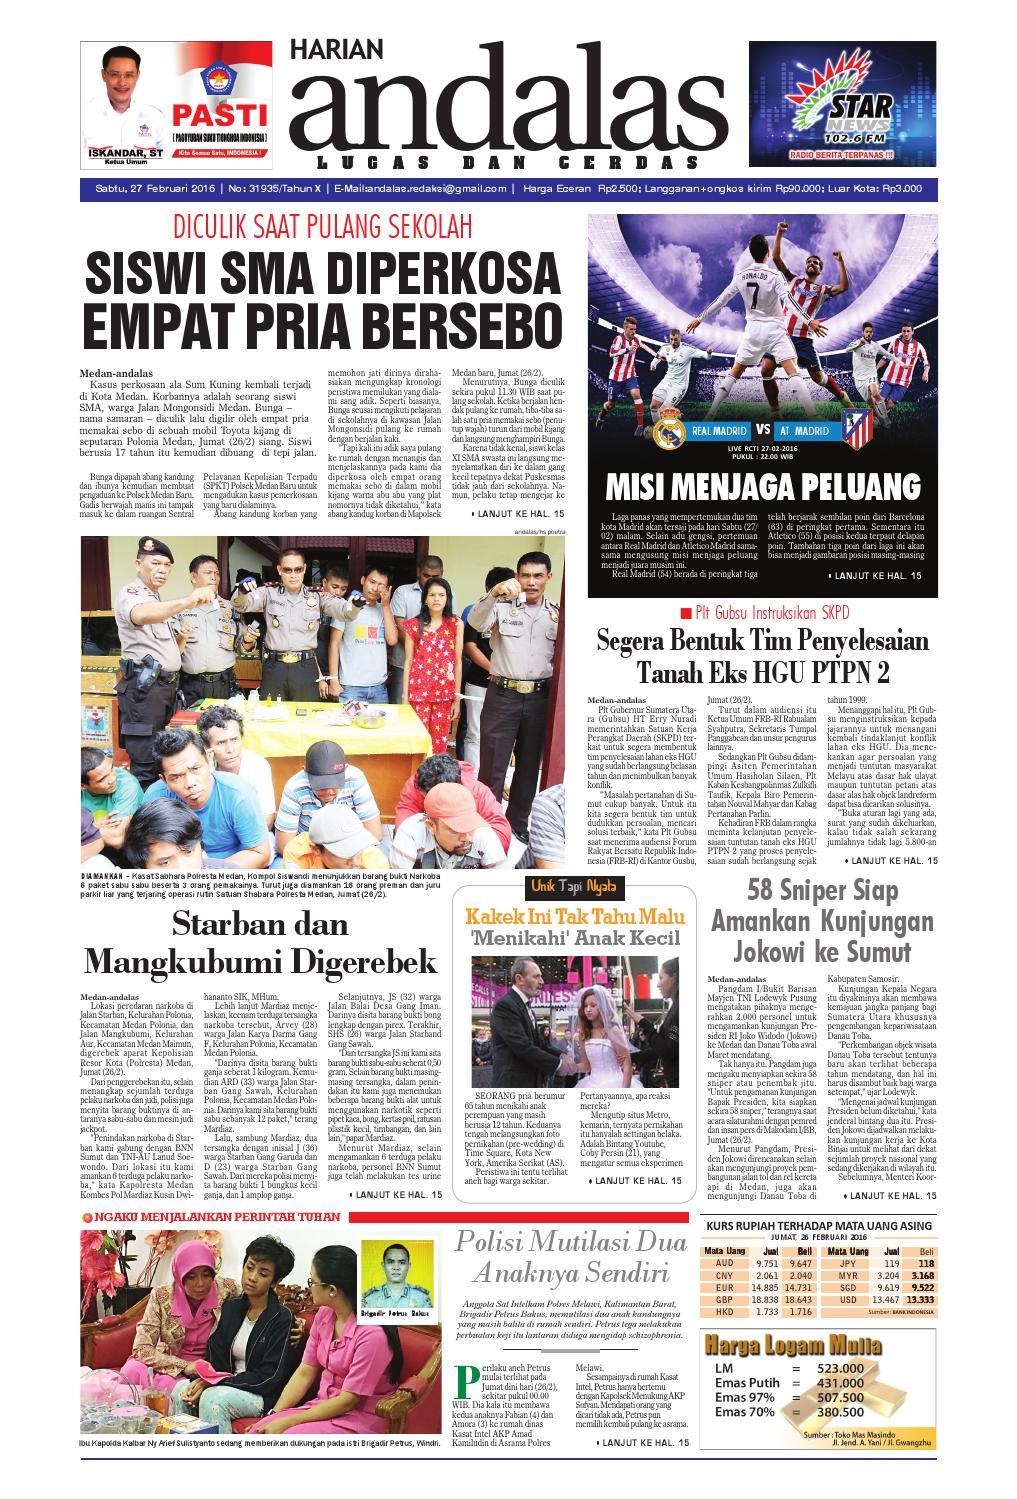 Epaper Andalas Edisi Sabtu 27 Februari 2016 By Media Issuu Fcenter Lemari Pakaian Wd Hk 1802 Sh Jawa Tengah